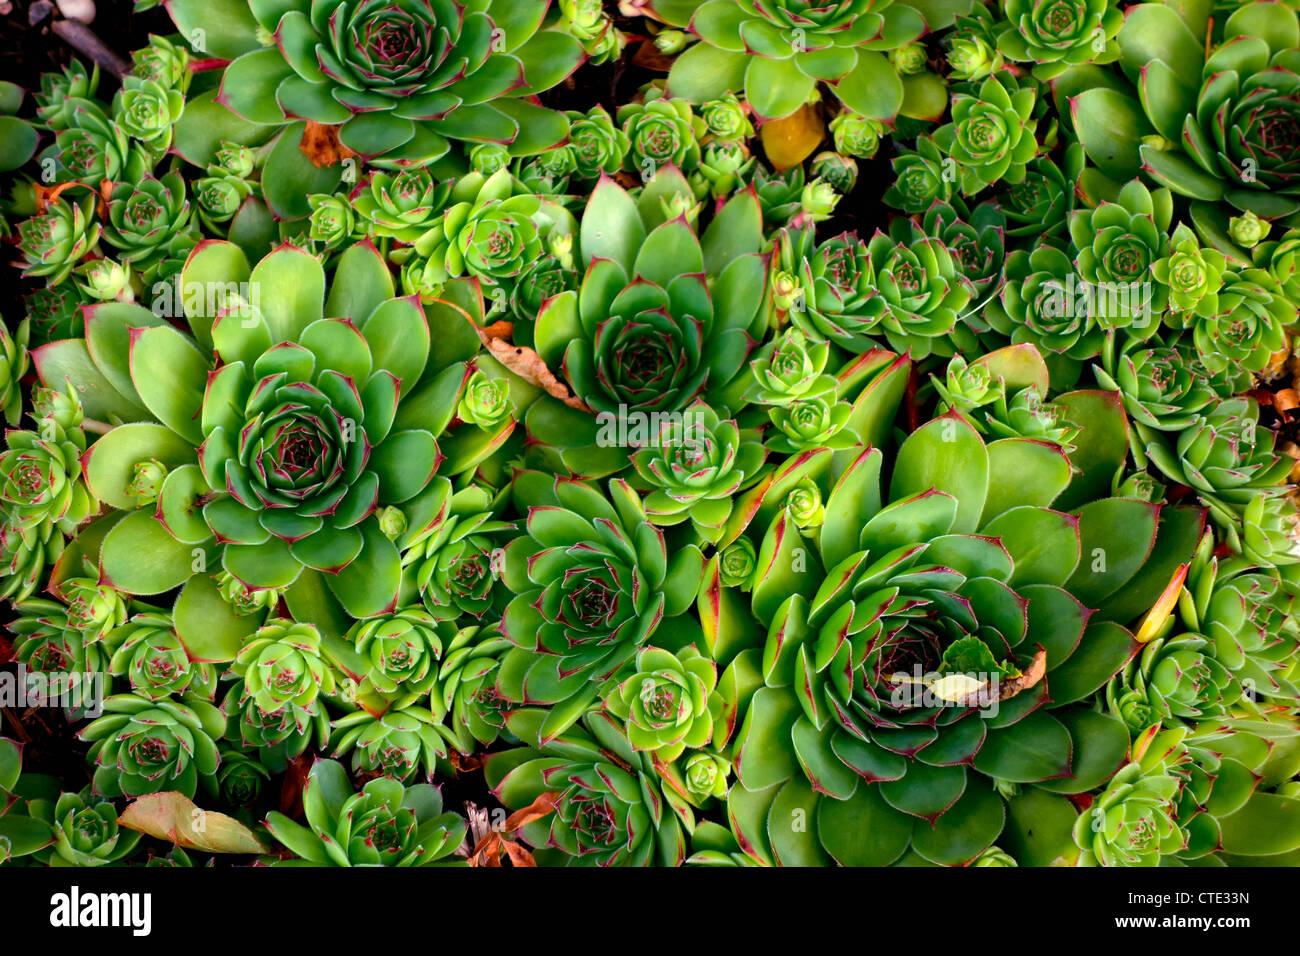 Purple Green Succulents Stockfotos & Purple Green Succulents Bilder ...